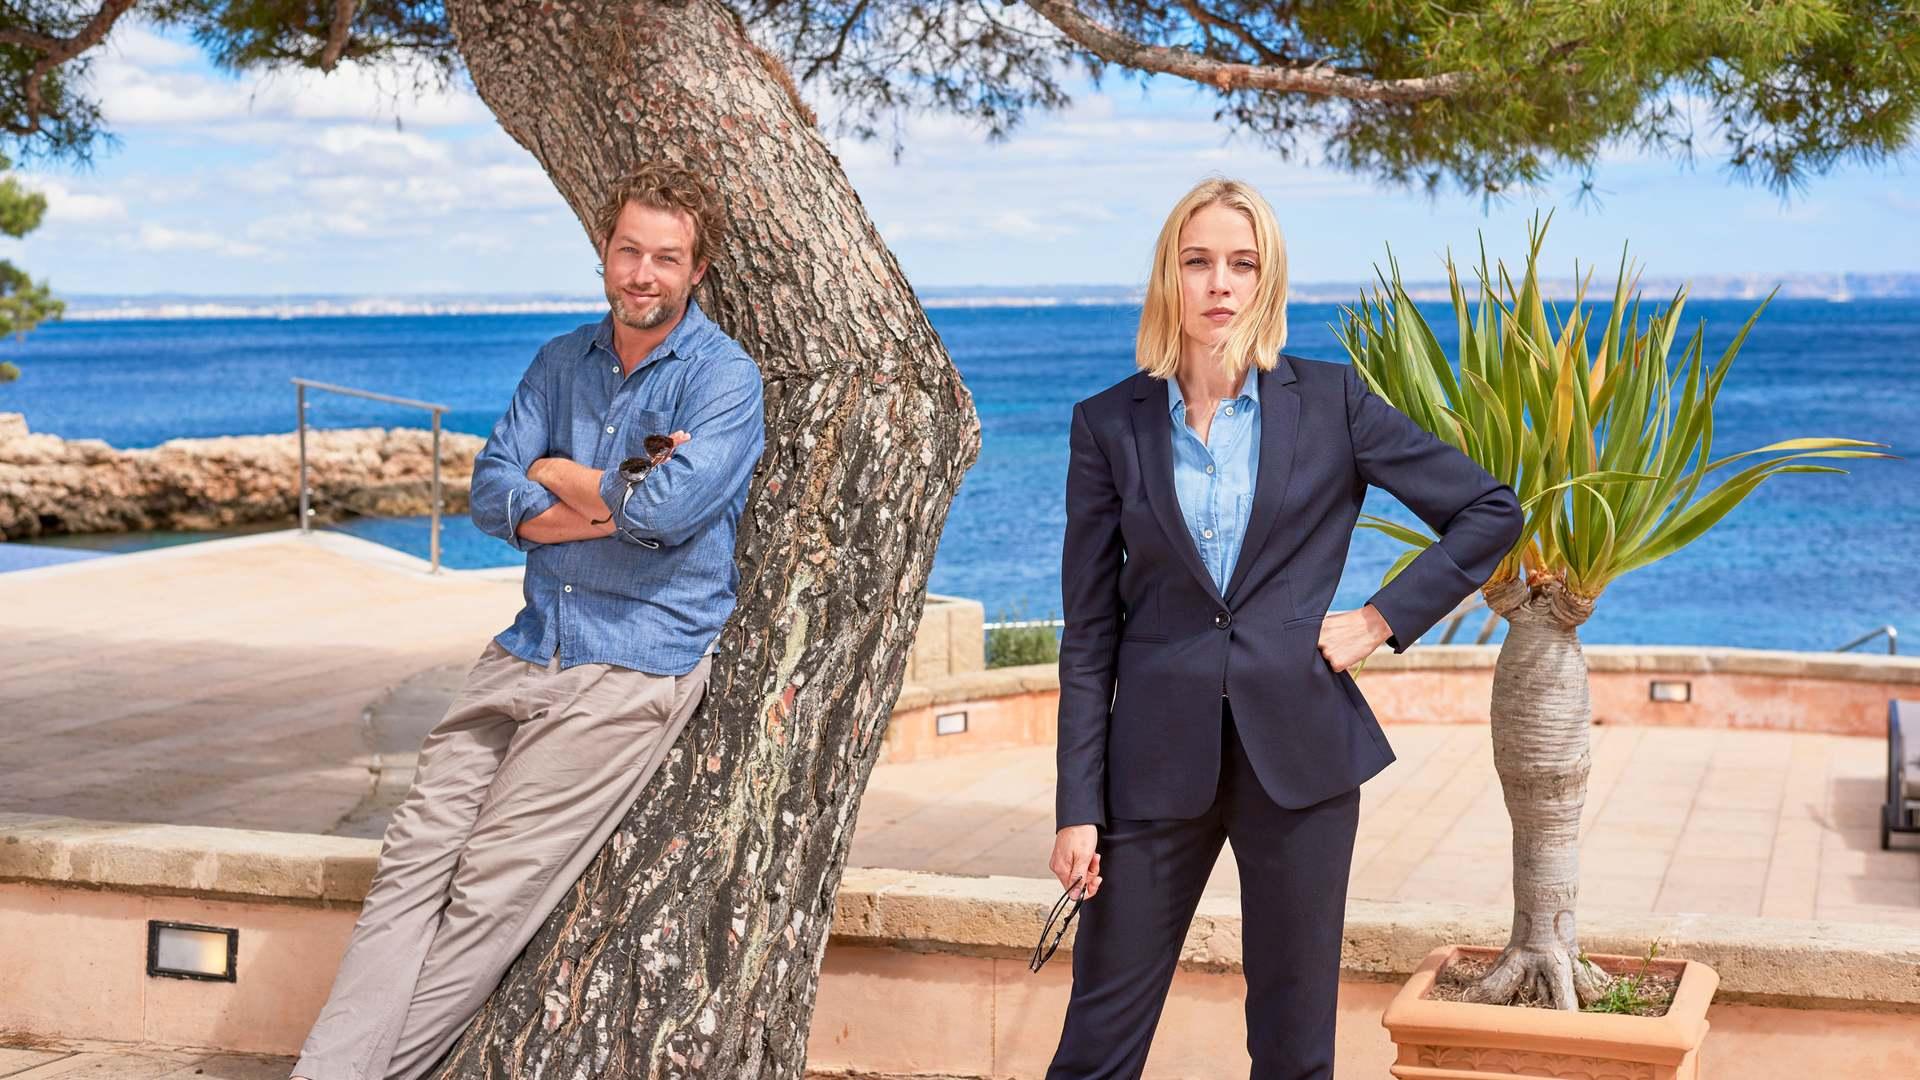 Кадры из фильма  The Mallorca Files 2019